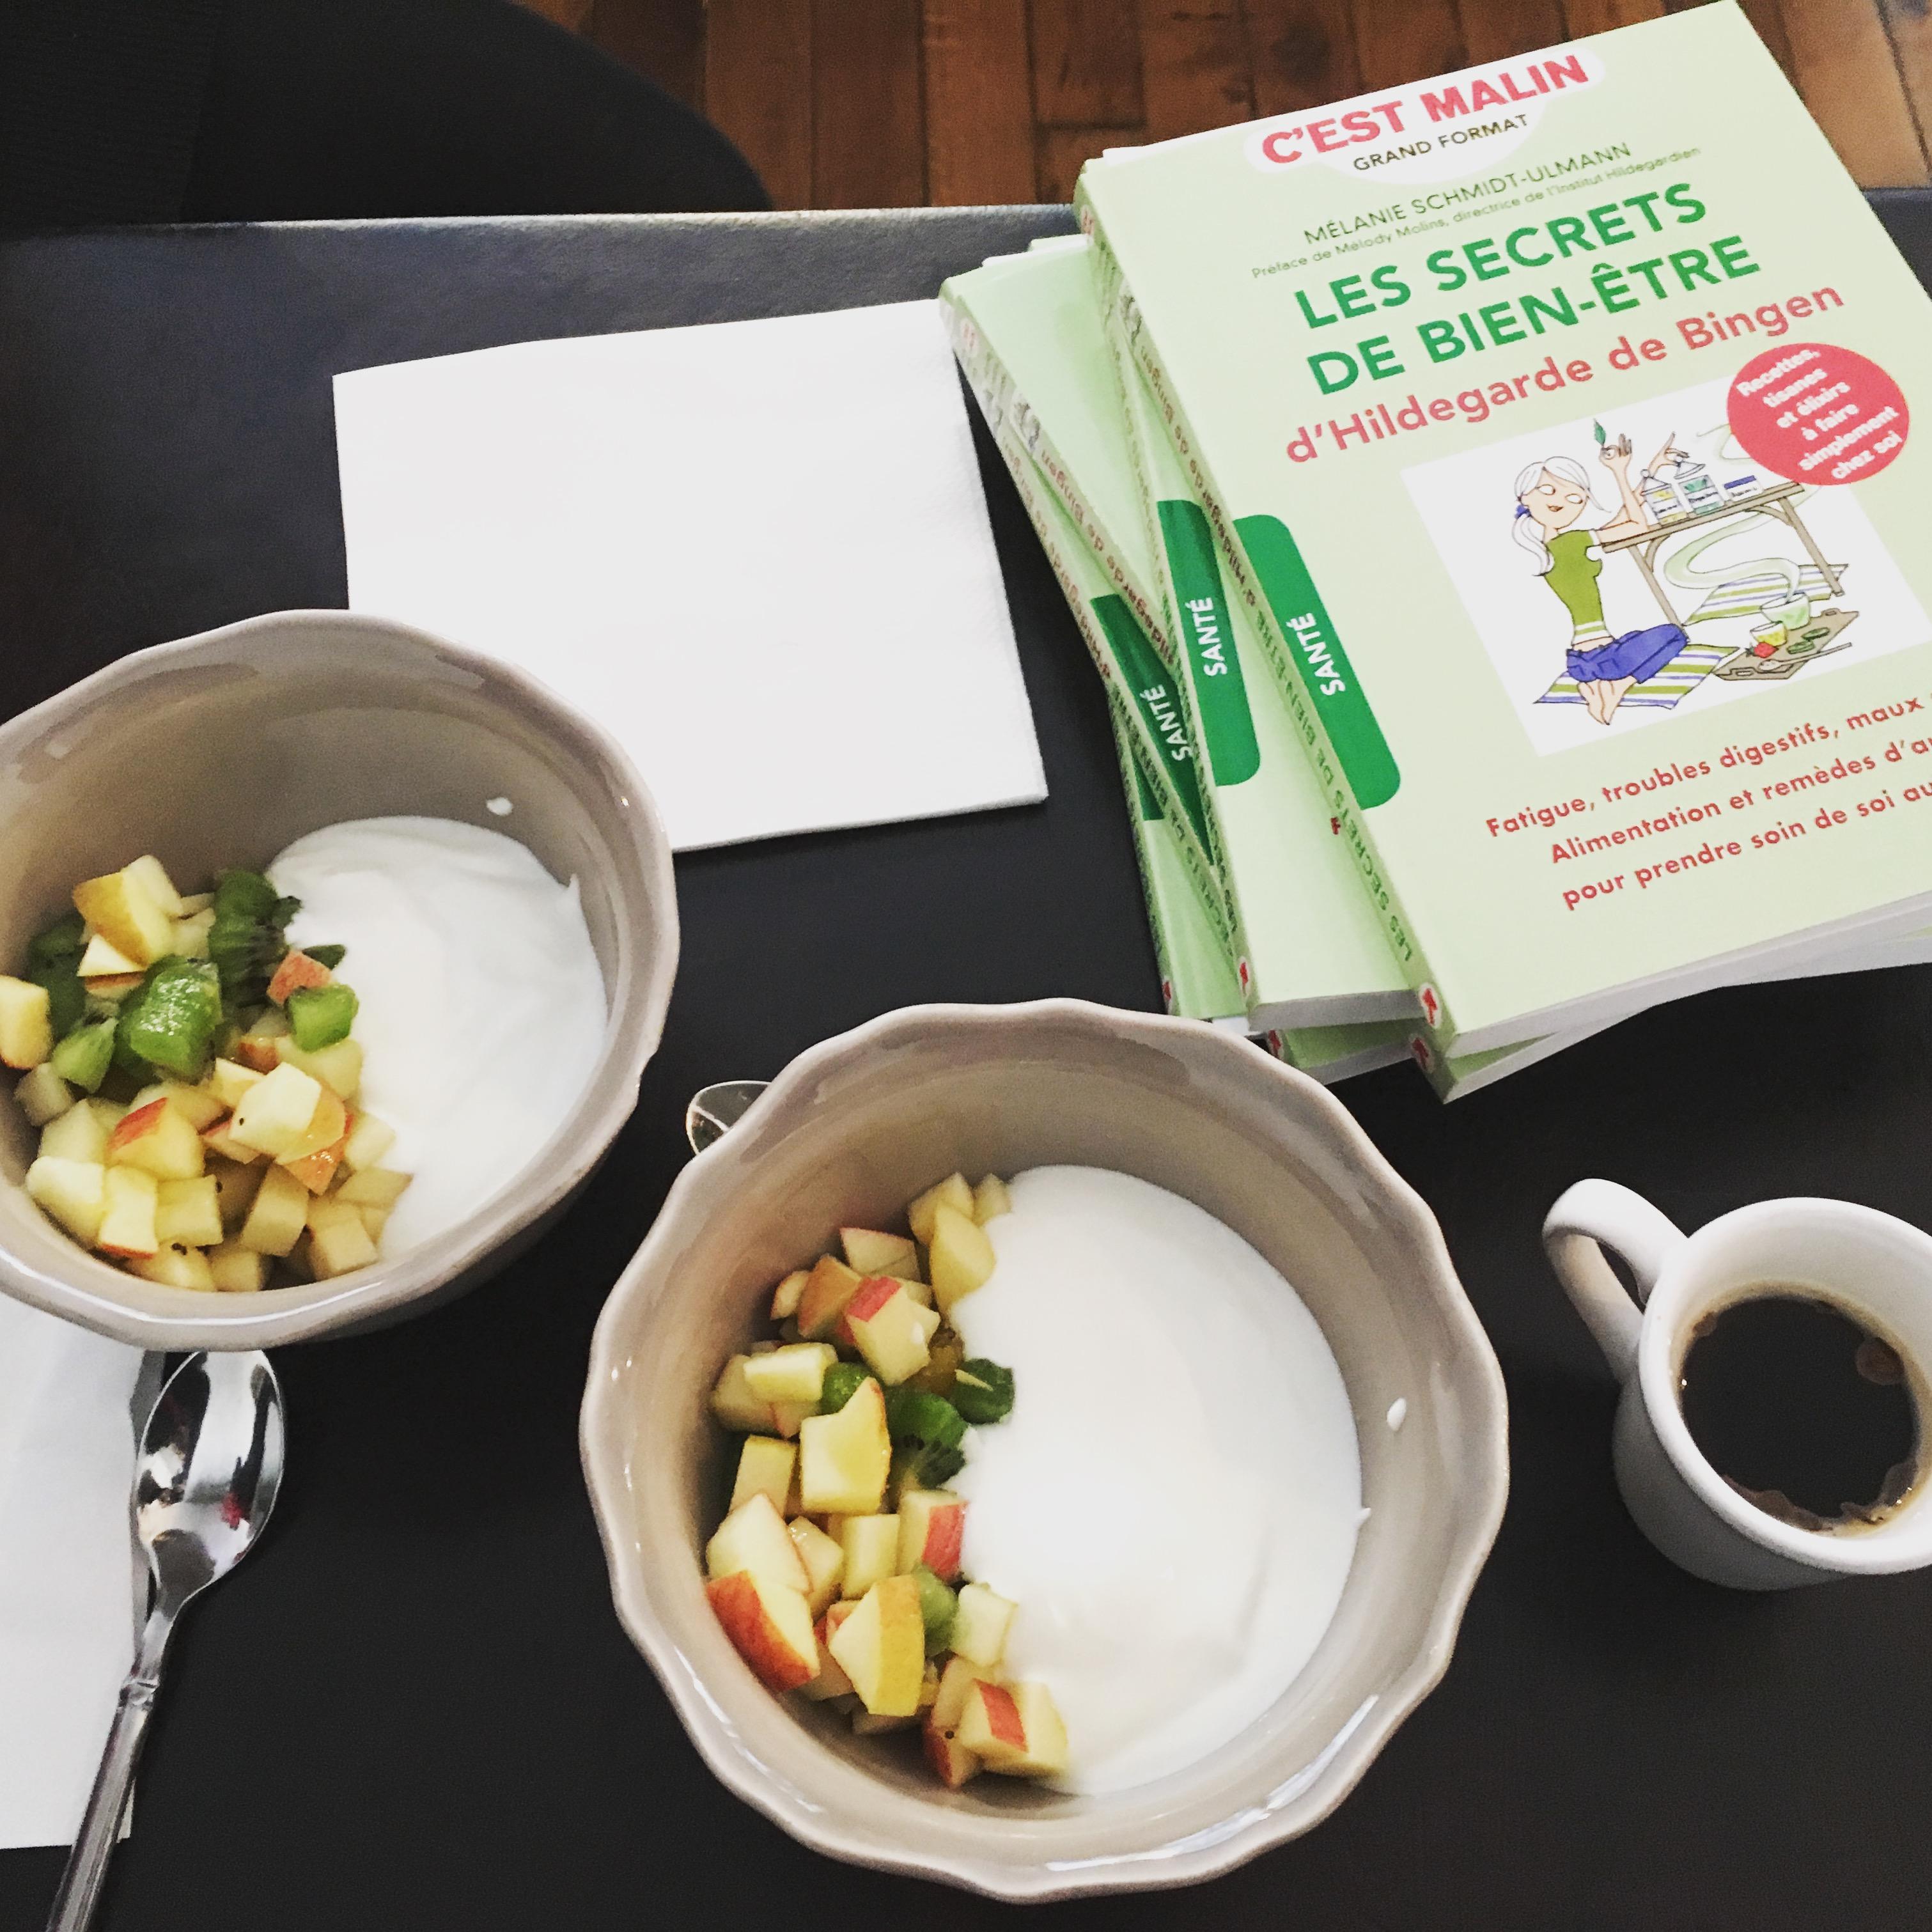 petit dejeuner alimentation saine et bio hildegarde de bingen